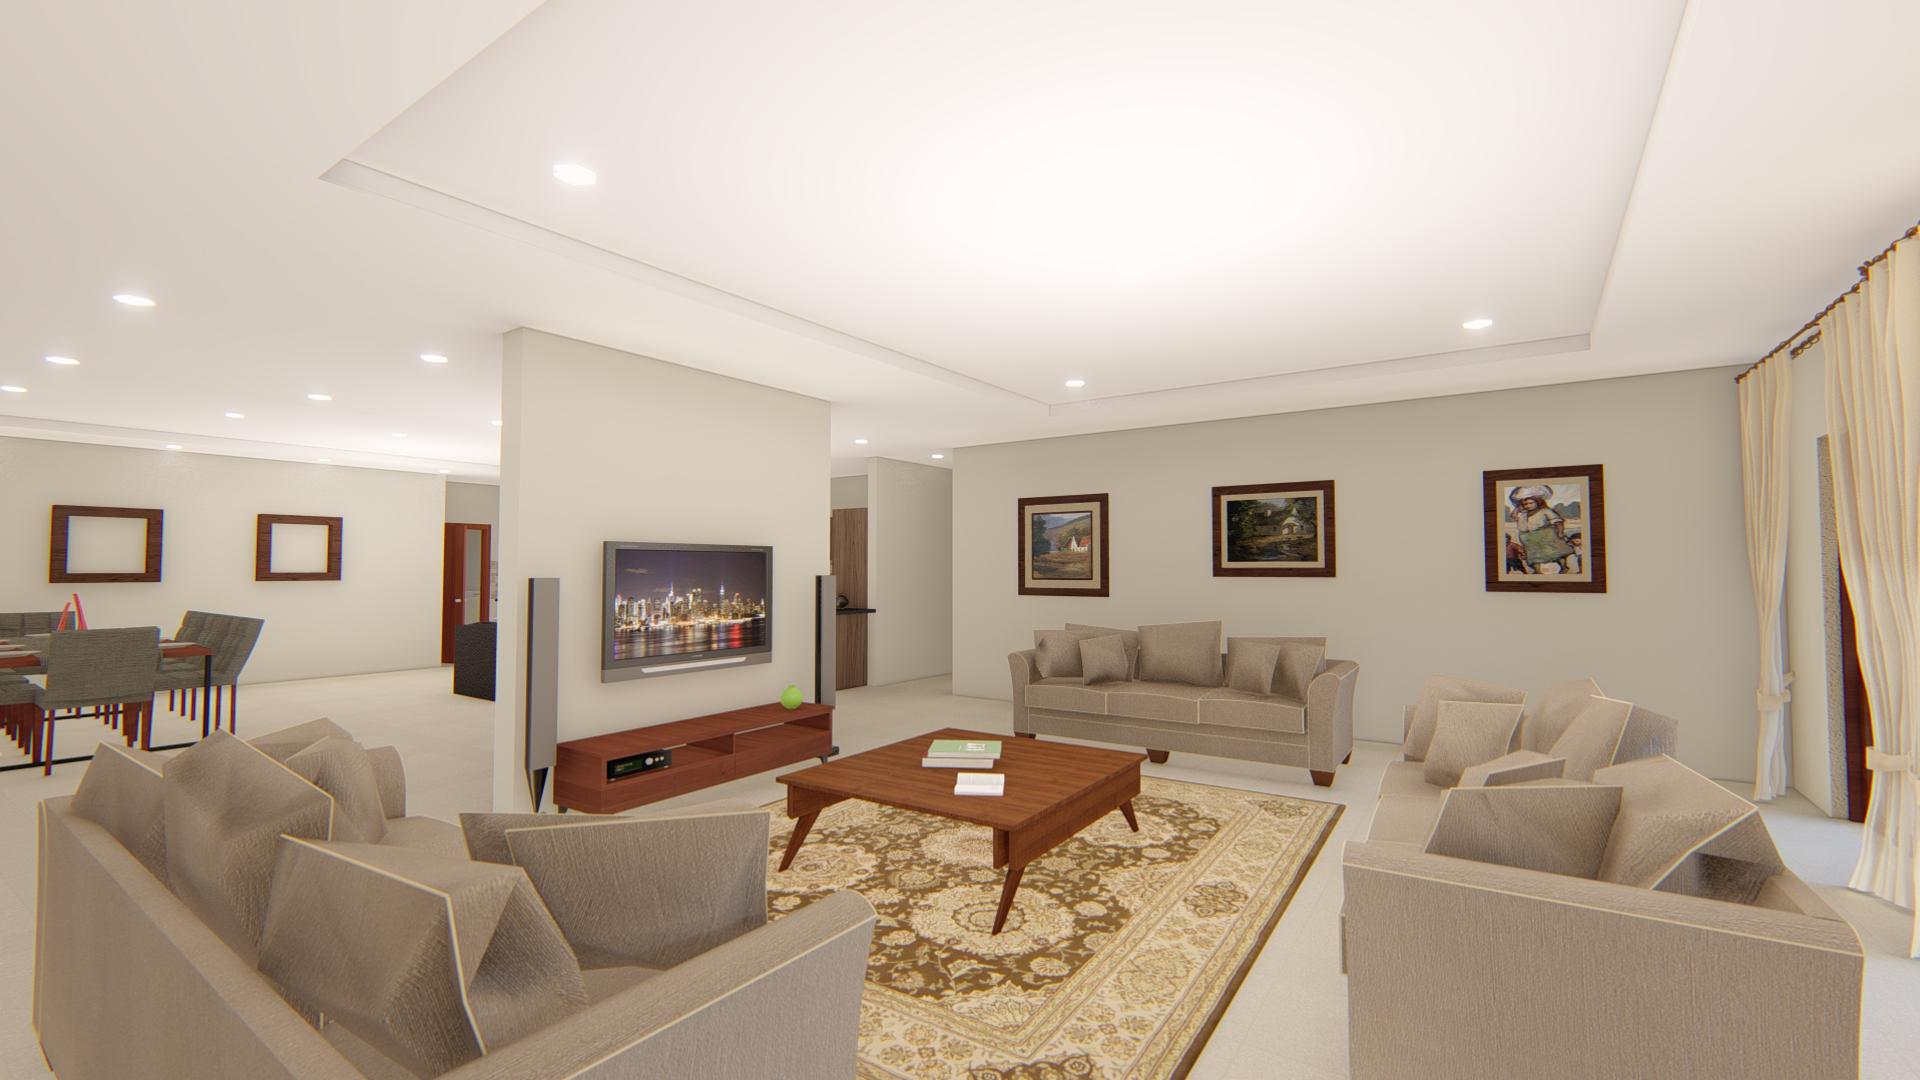 Kameeldrift house Interior 1.jpg